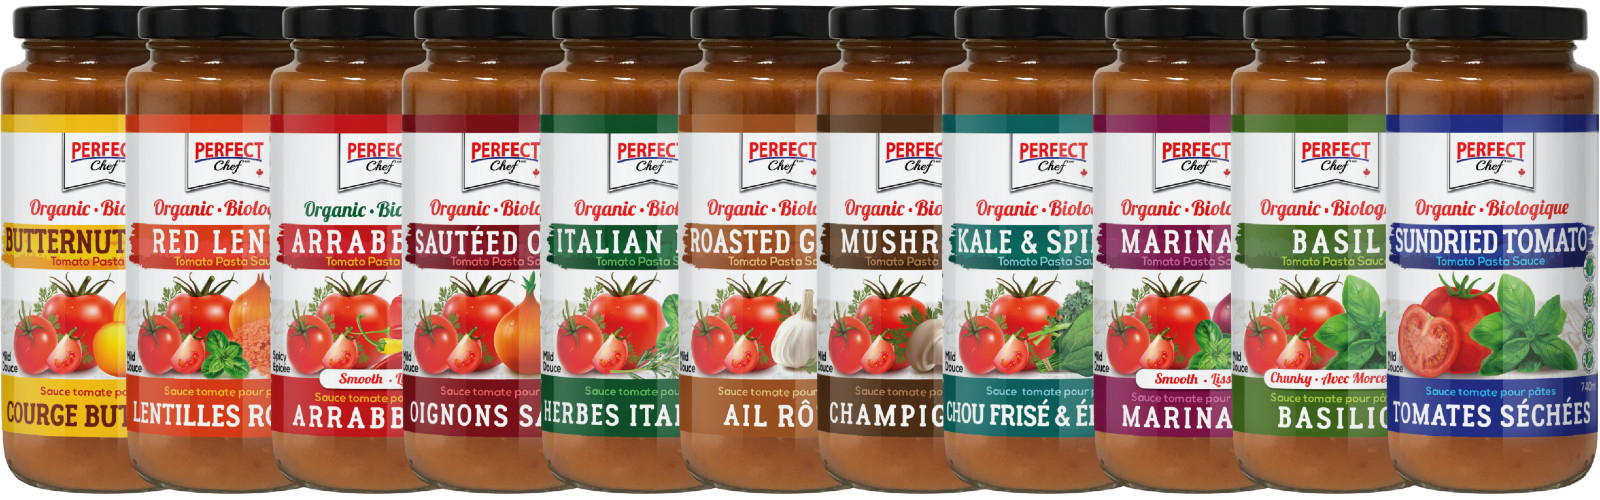 Perfect Chef Organic Pasta Sauce banner